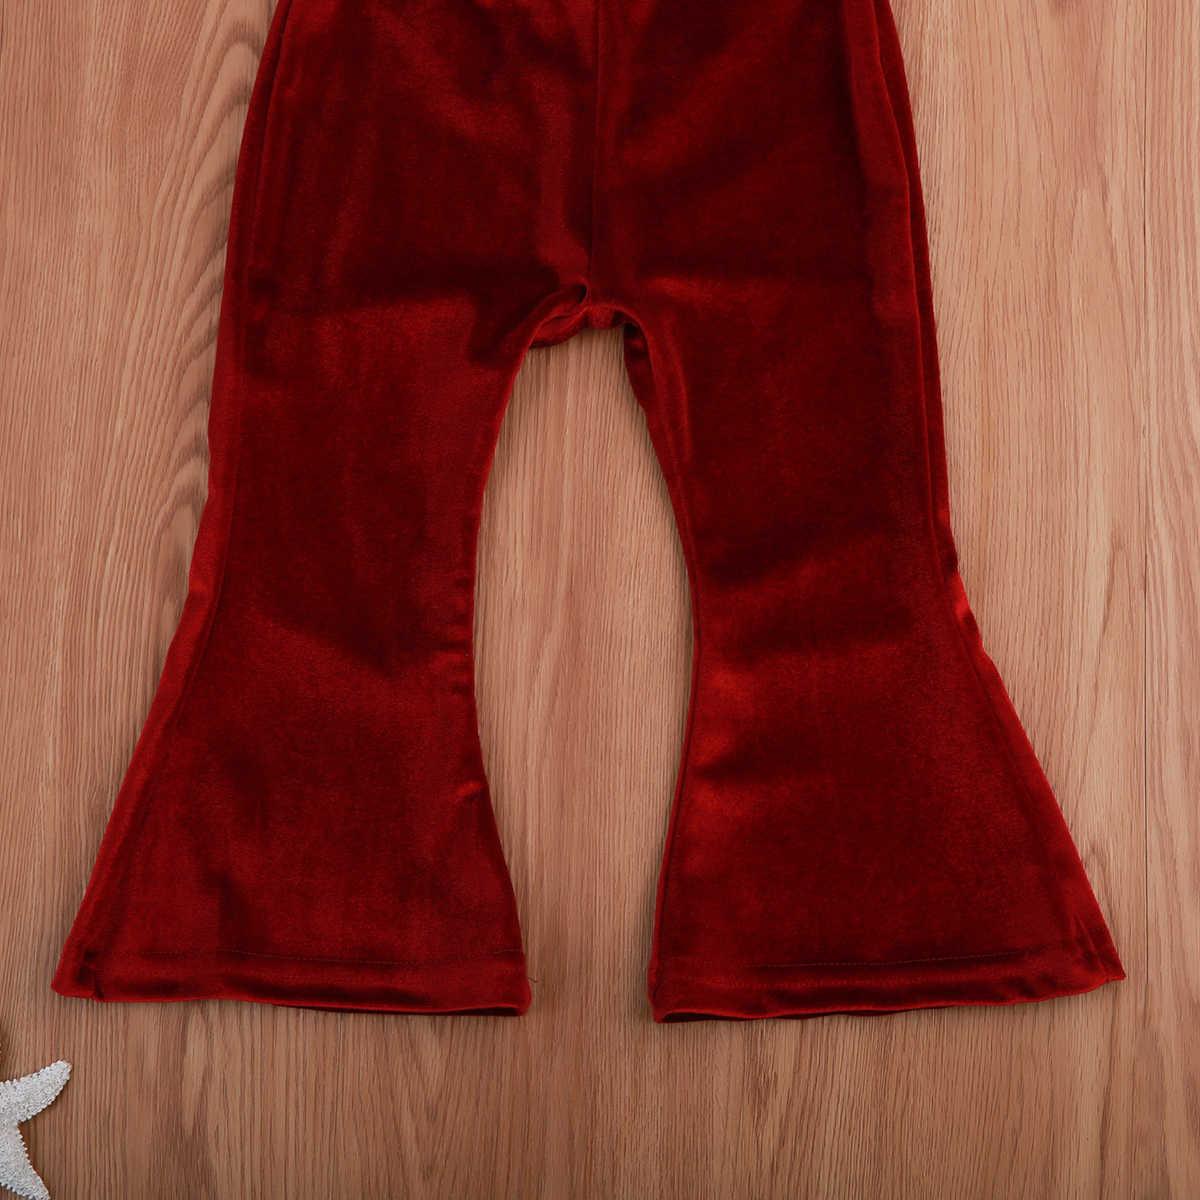 Lucu Balita Anak-anak Bayi Perempuan Bell Bottom Lebar Kaki Peregangan Beludru Celana Panjang Celana Flare Pants Outfit